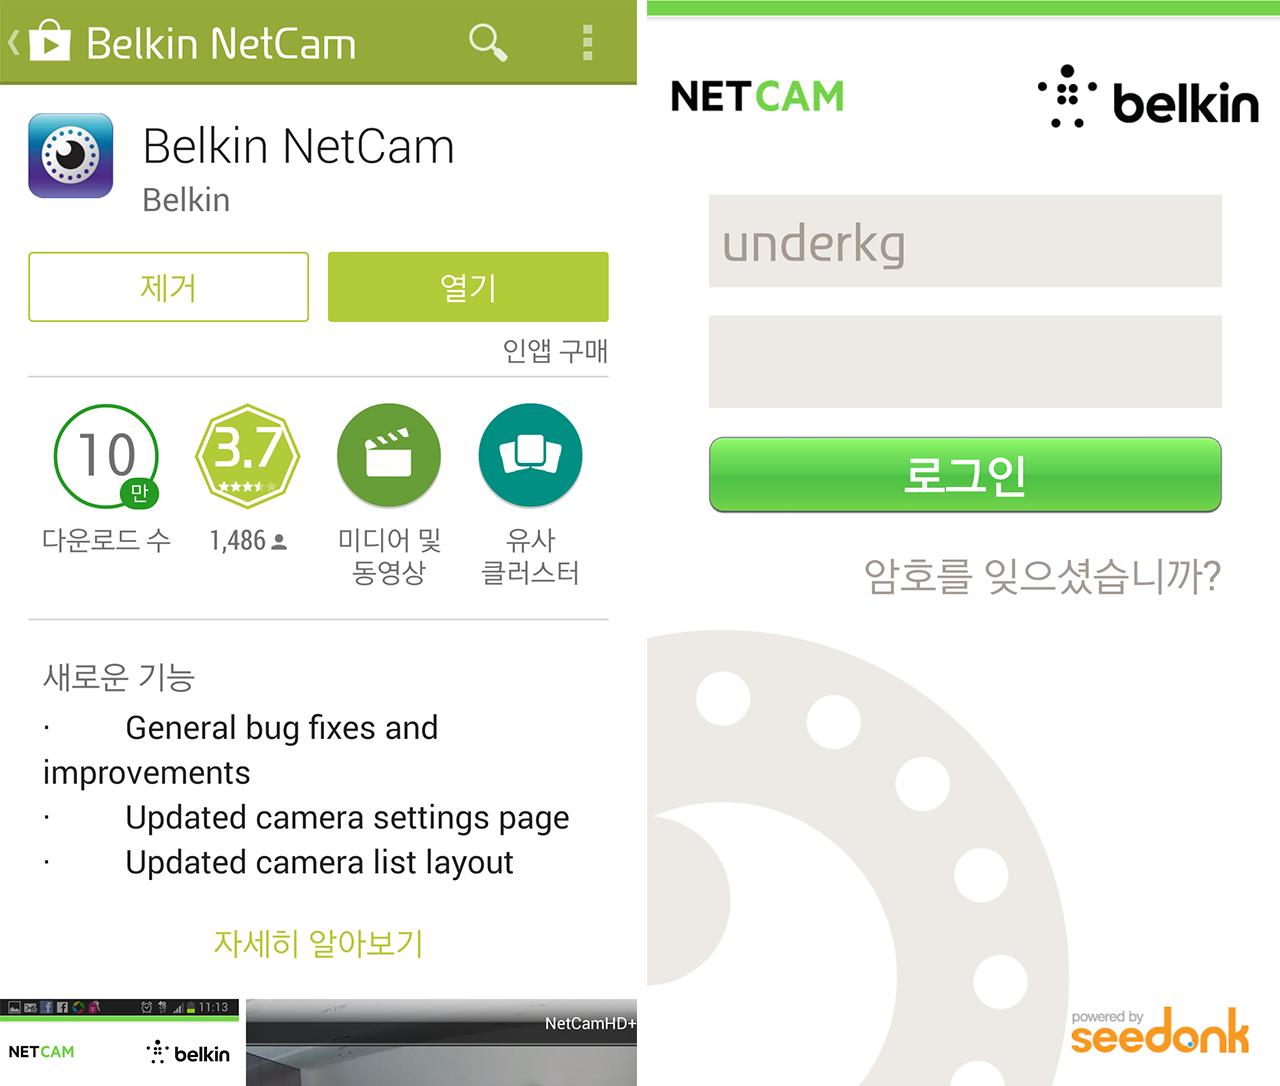 belkin_netcam_12.jpg